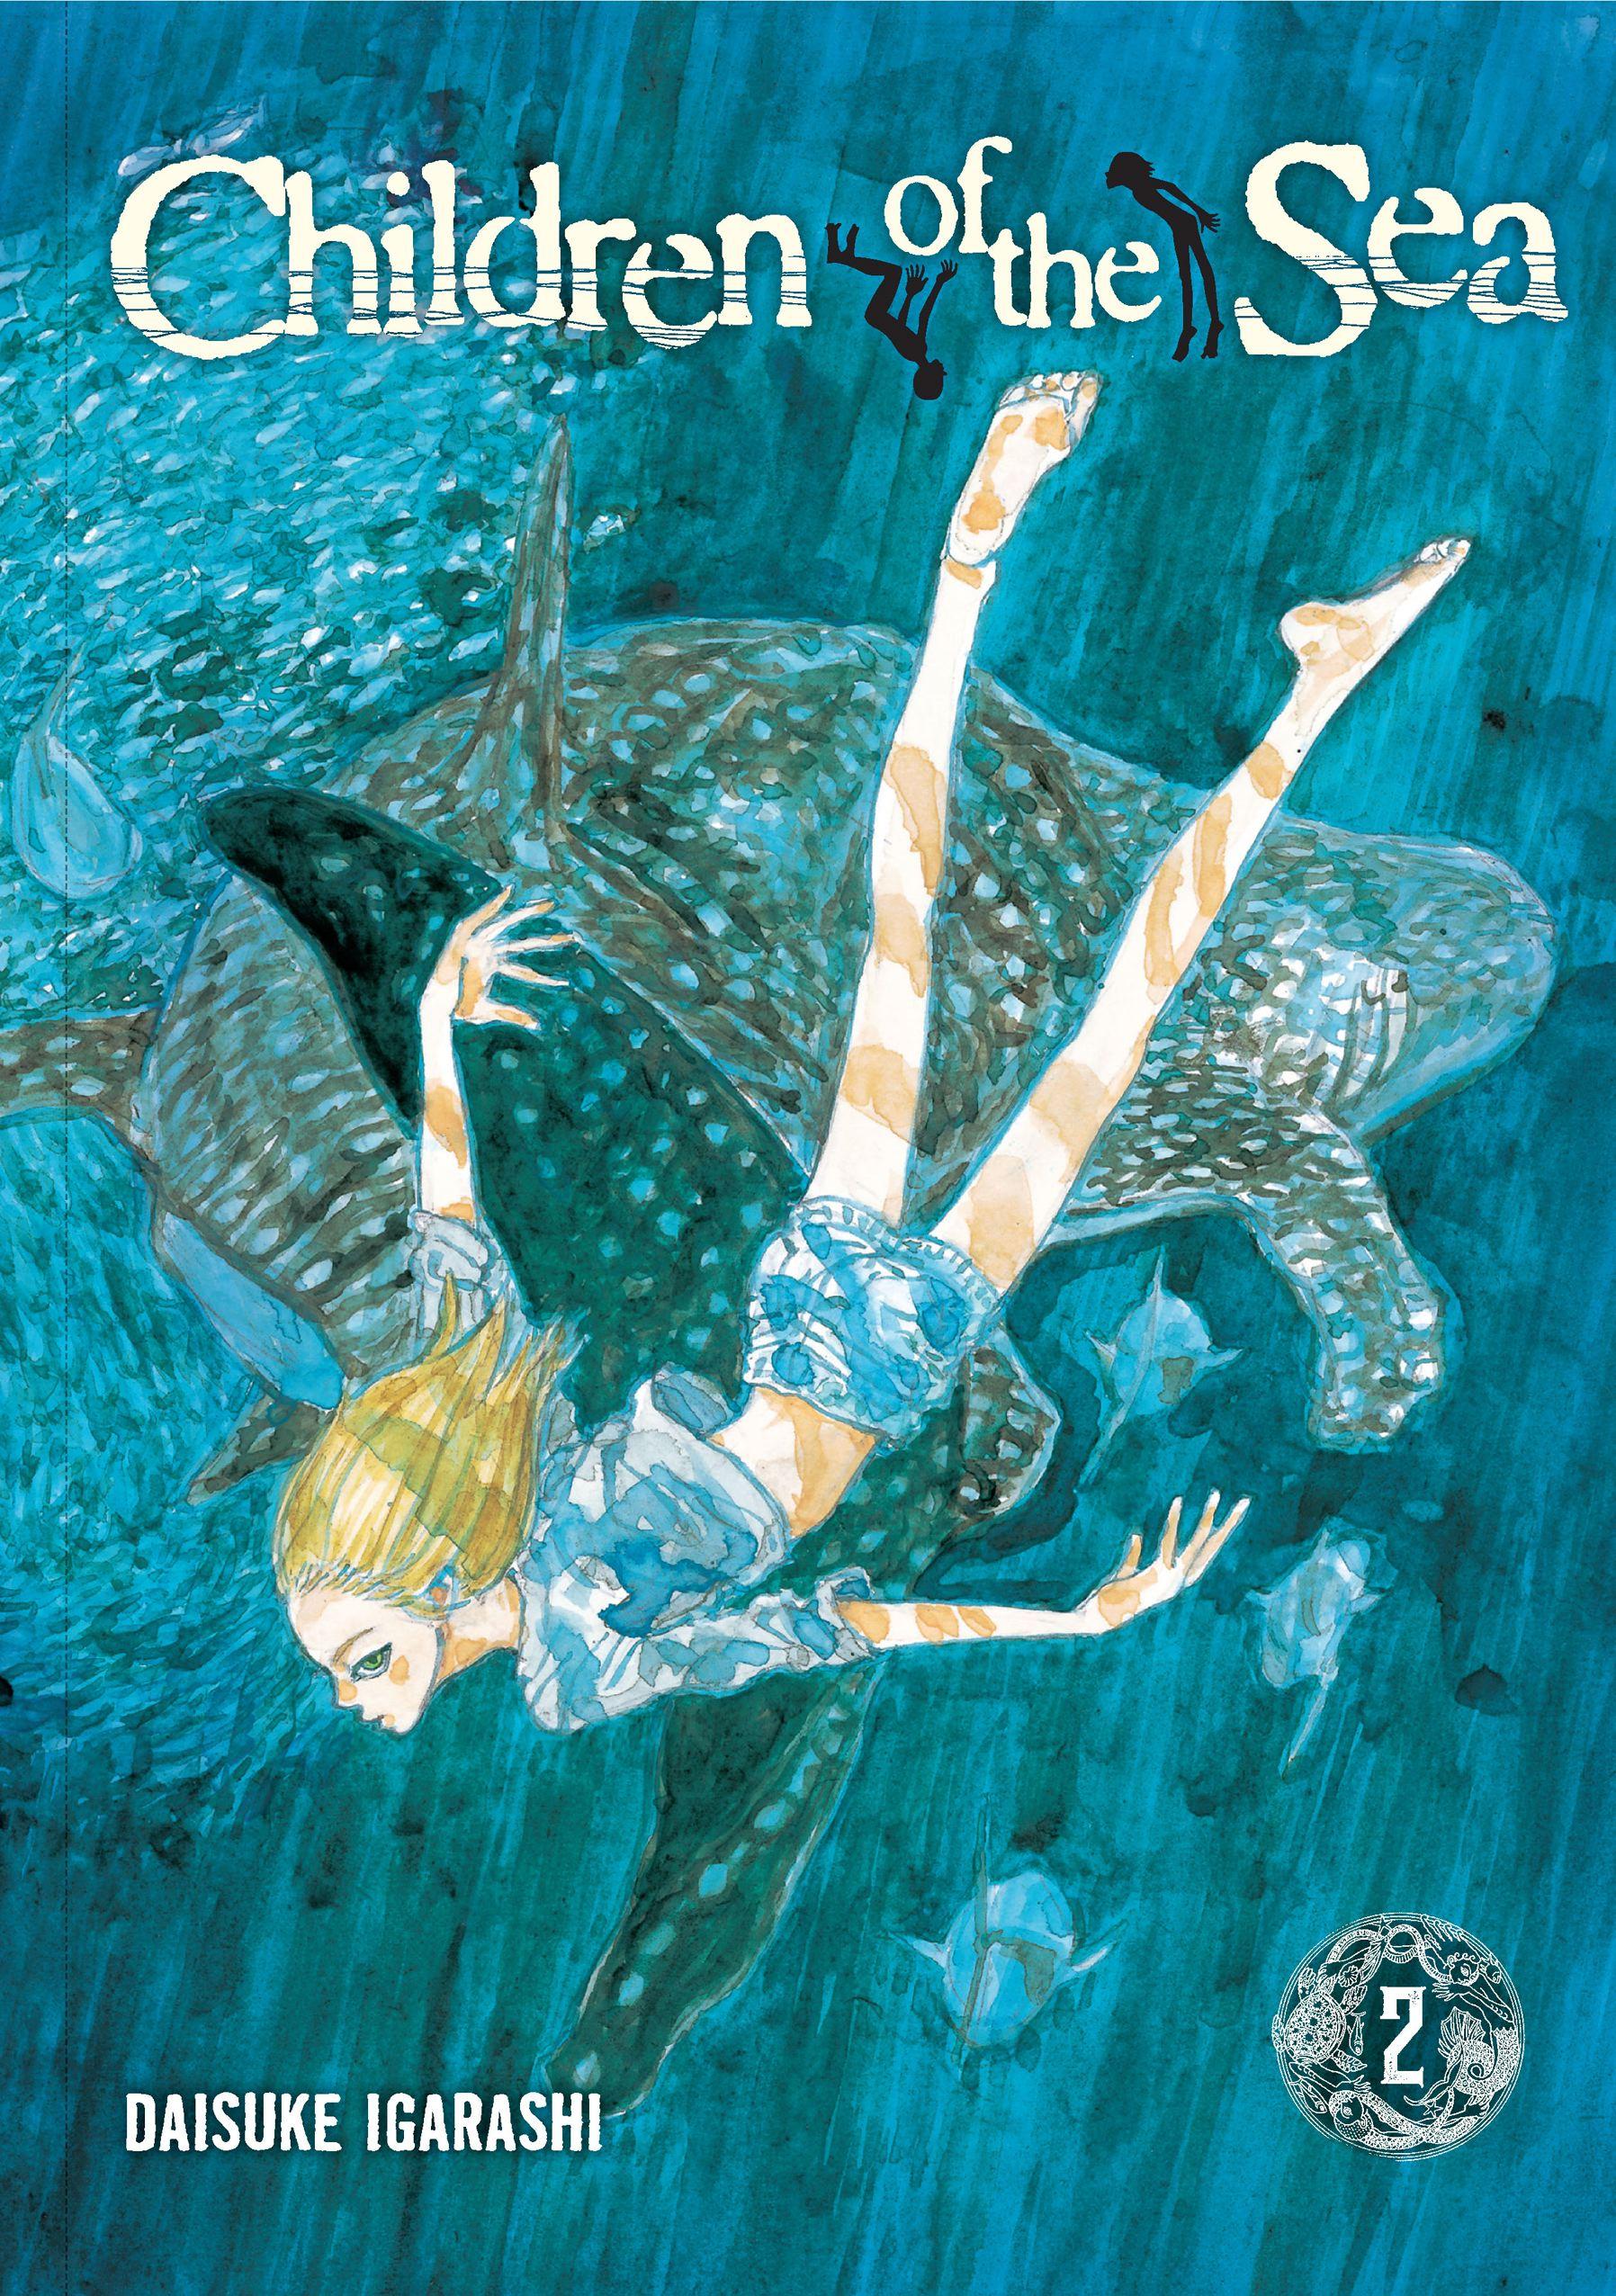 Children of the sea vol 2 9781421529196 hr